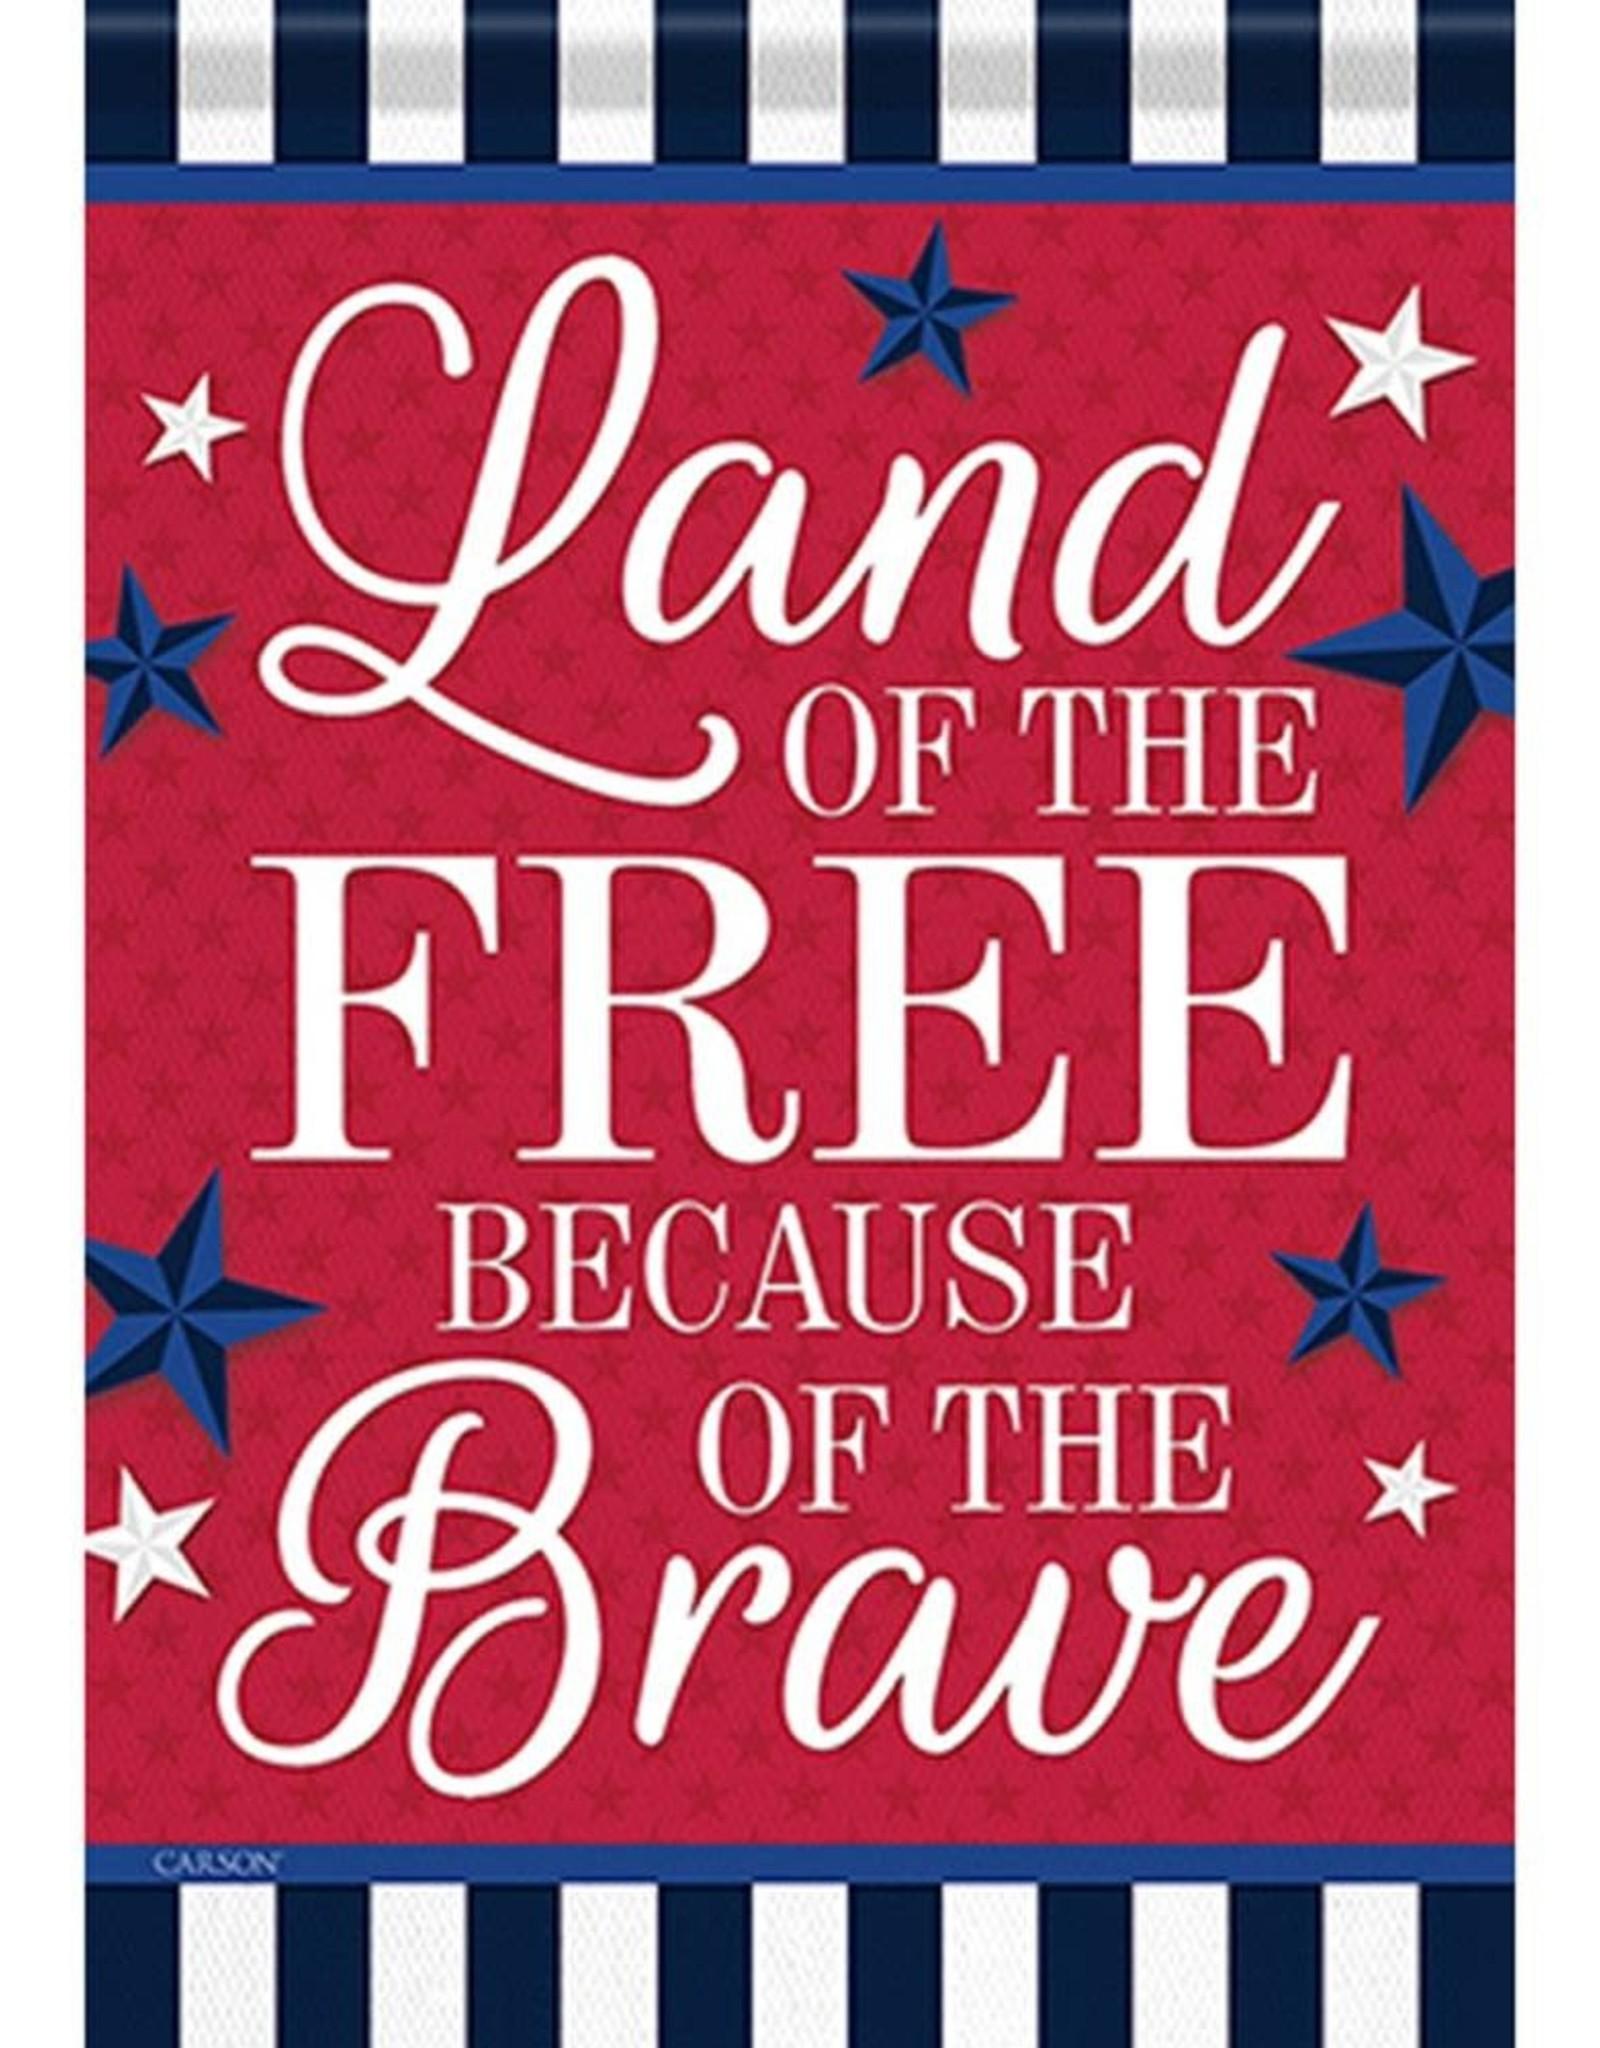 Carson C Land of the Free GF